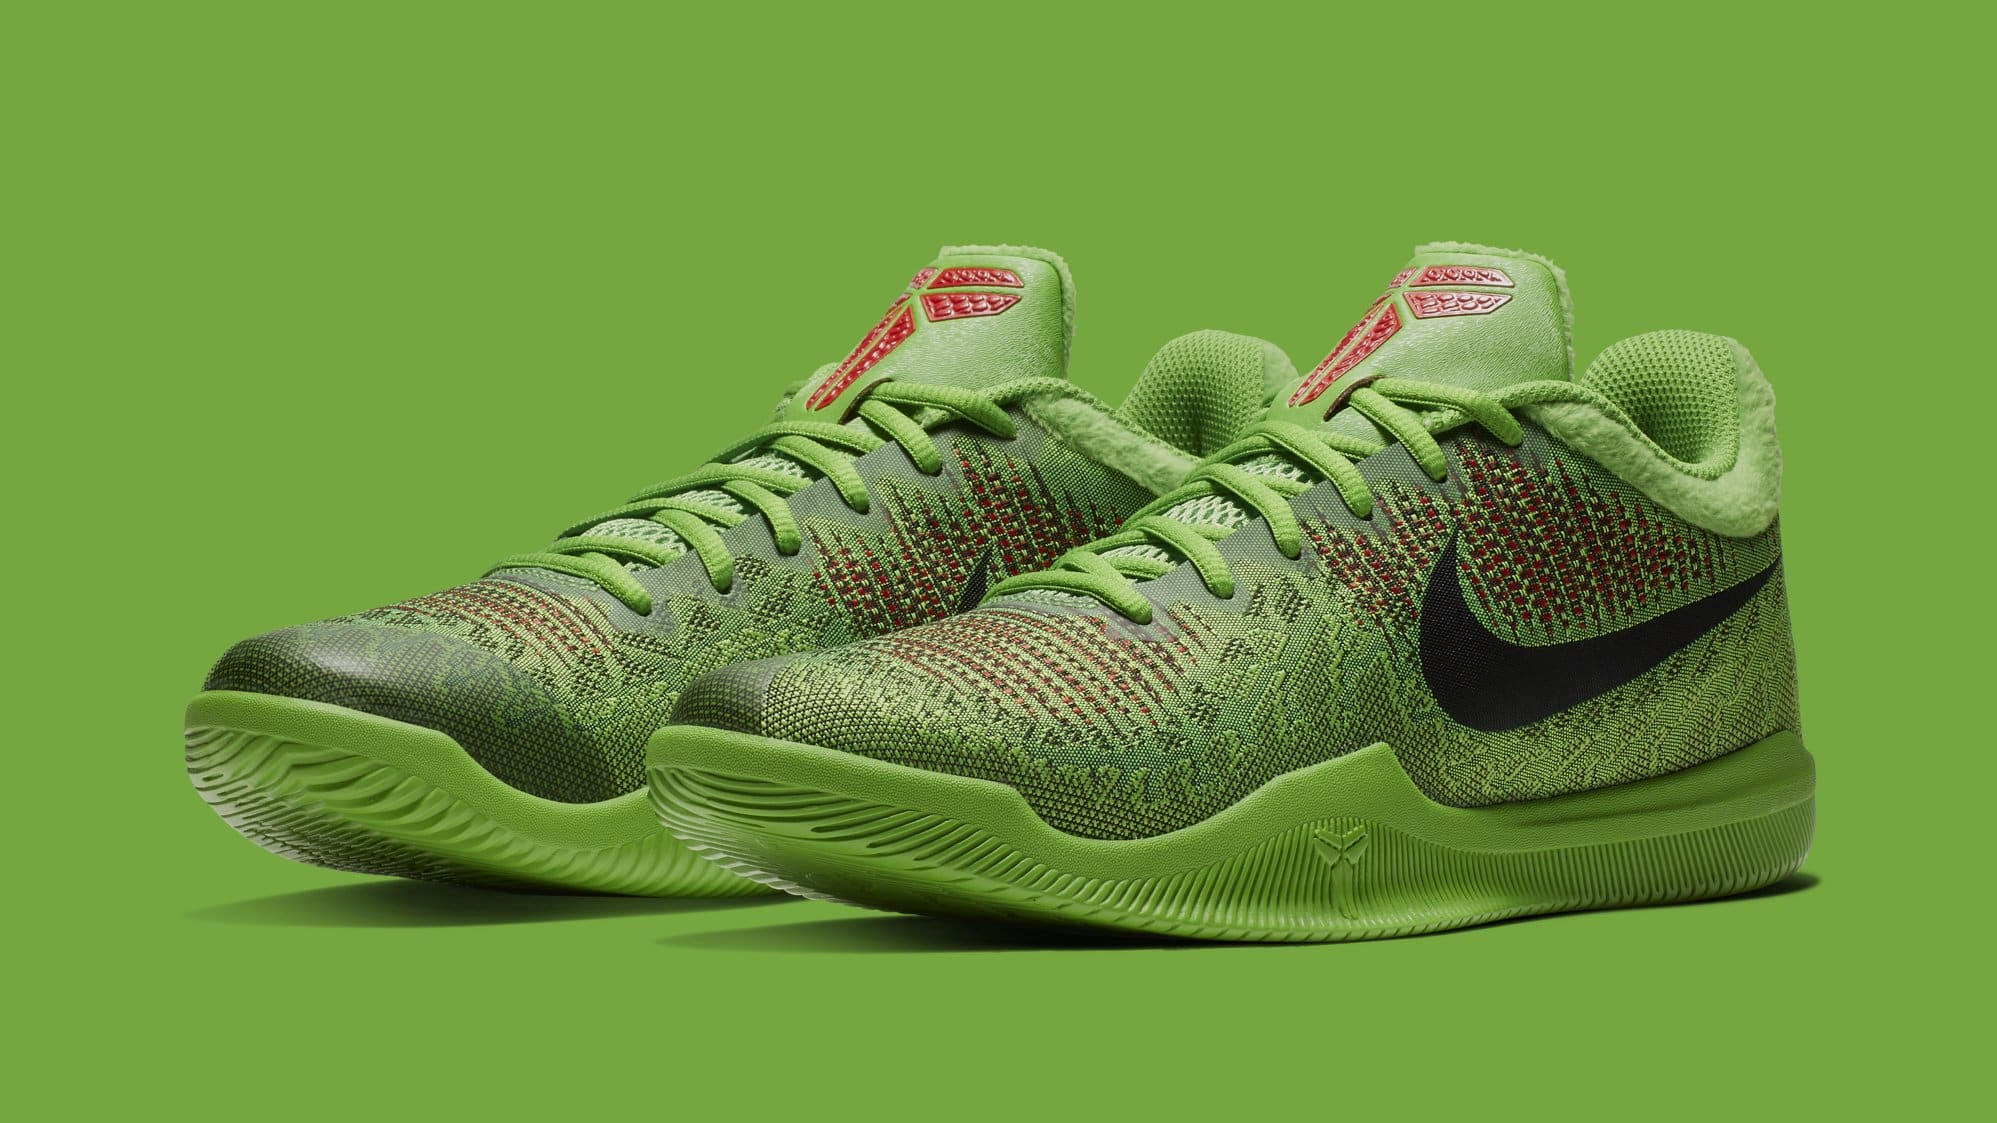 Nike Mamba Rage EP \'Electric Green\' 908974-300 | Sole Collector